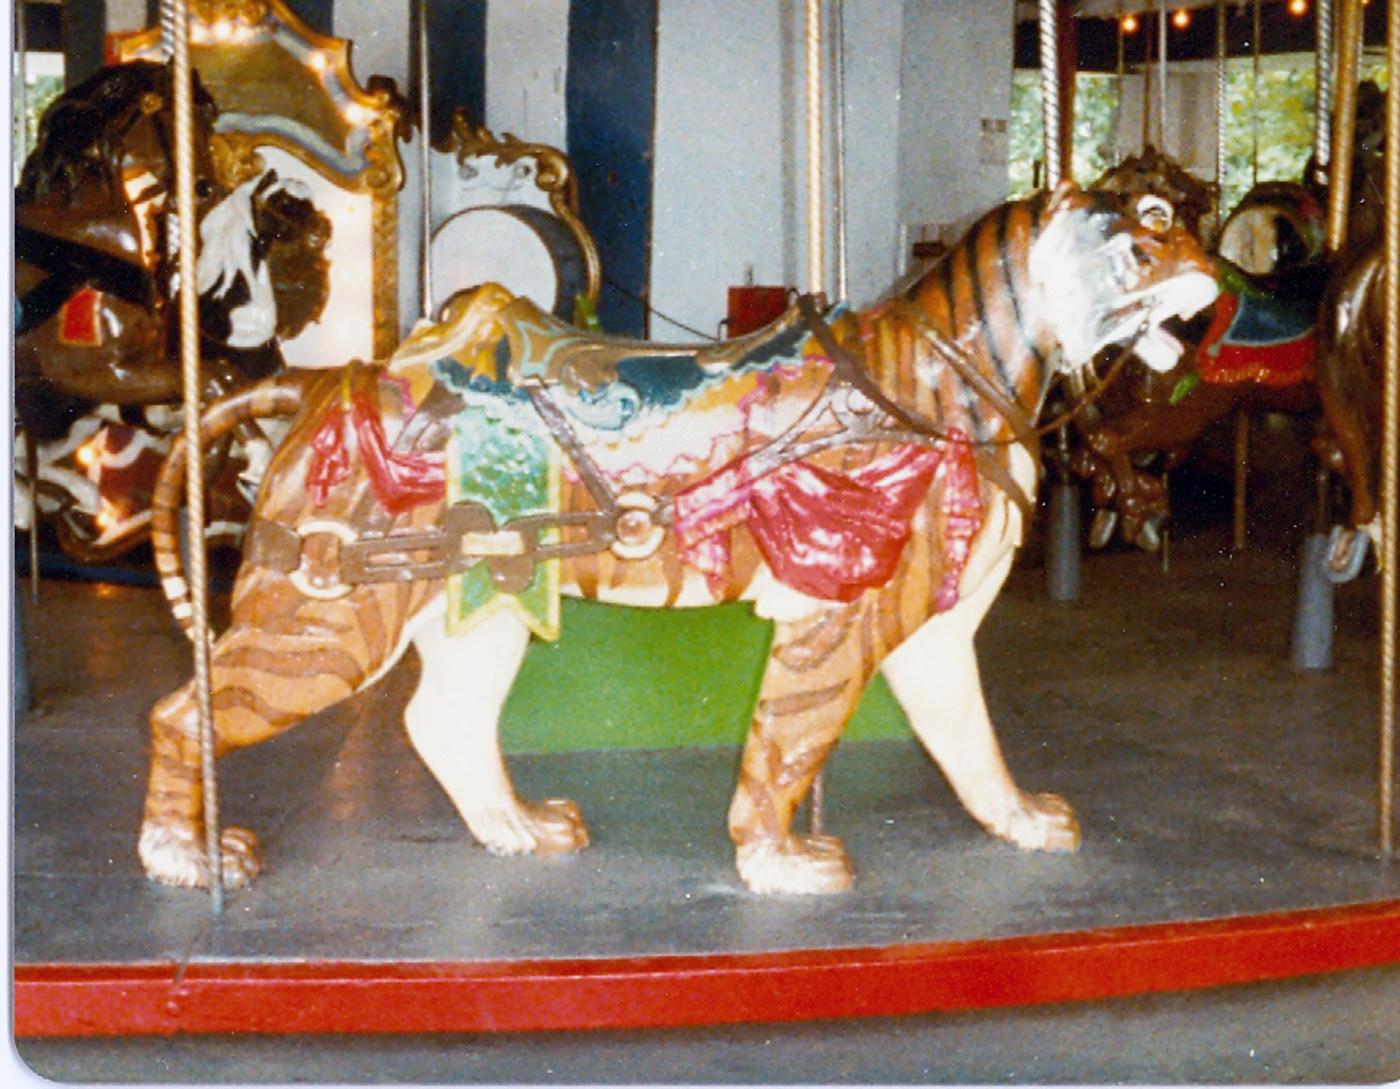 1902-E-Joy-Morris-Menagerie-Carousel-Quassy-Lake-Park-1979-photos-046